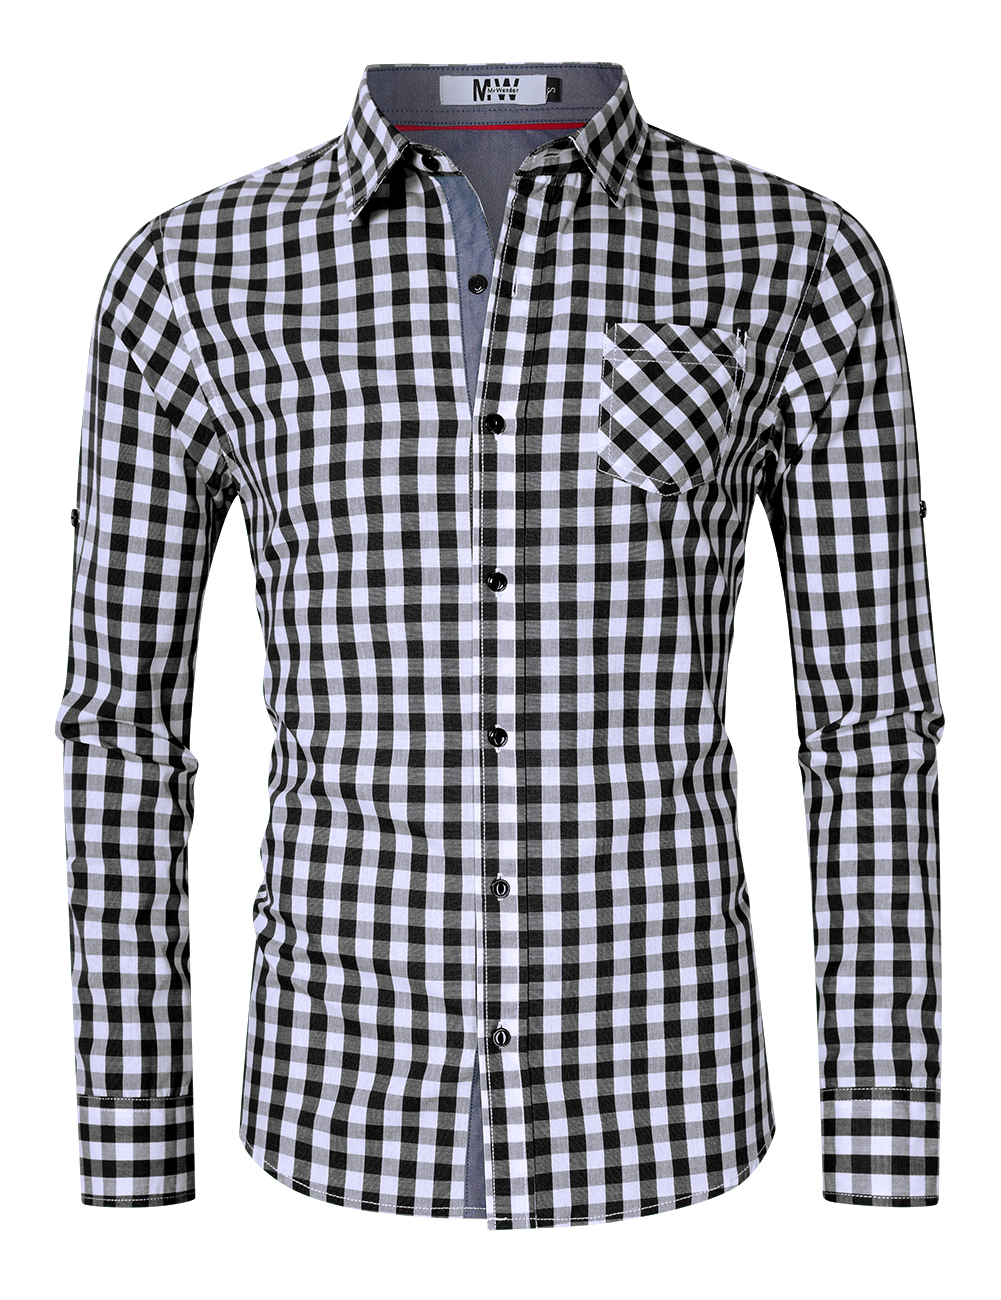 MrWonder Men's Slim Fit 100% Cotton Button Down Long Sleeve Plaid Shirt Black and white grid_L